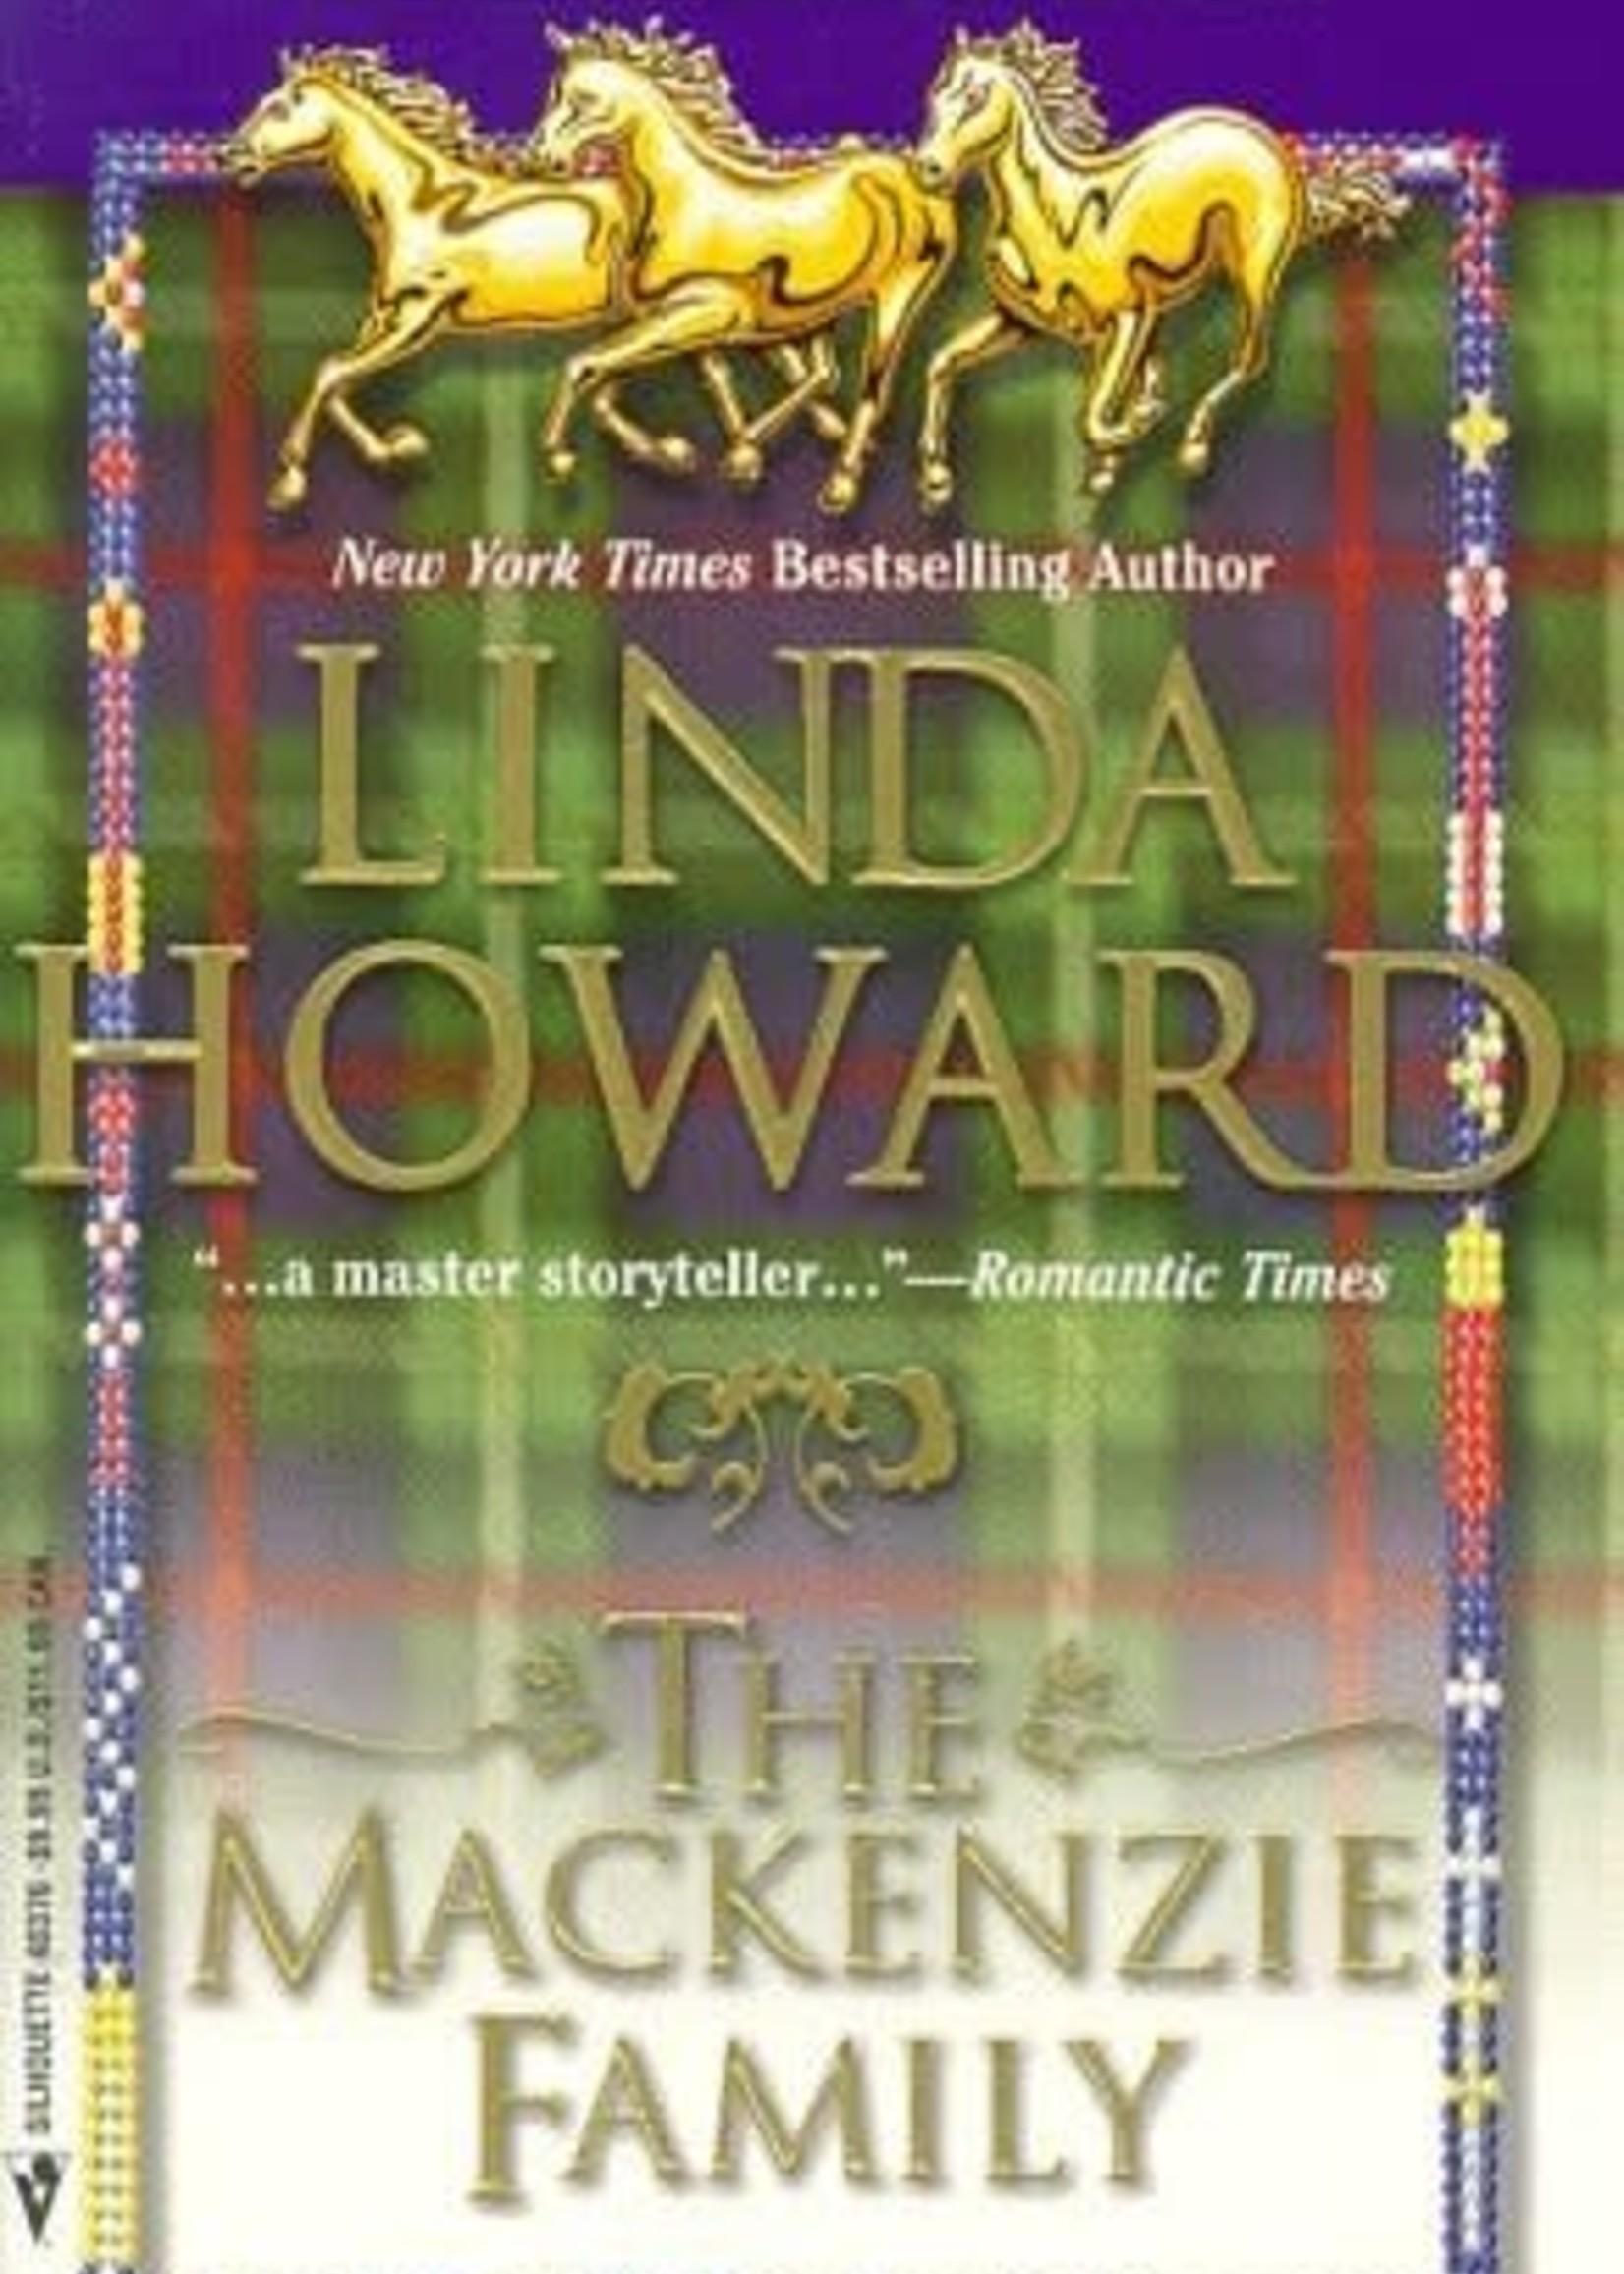 USED - The MacKenzie Family by Linda Howard